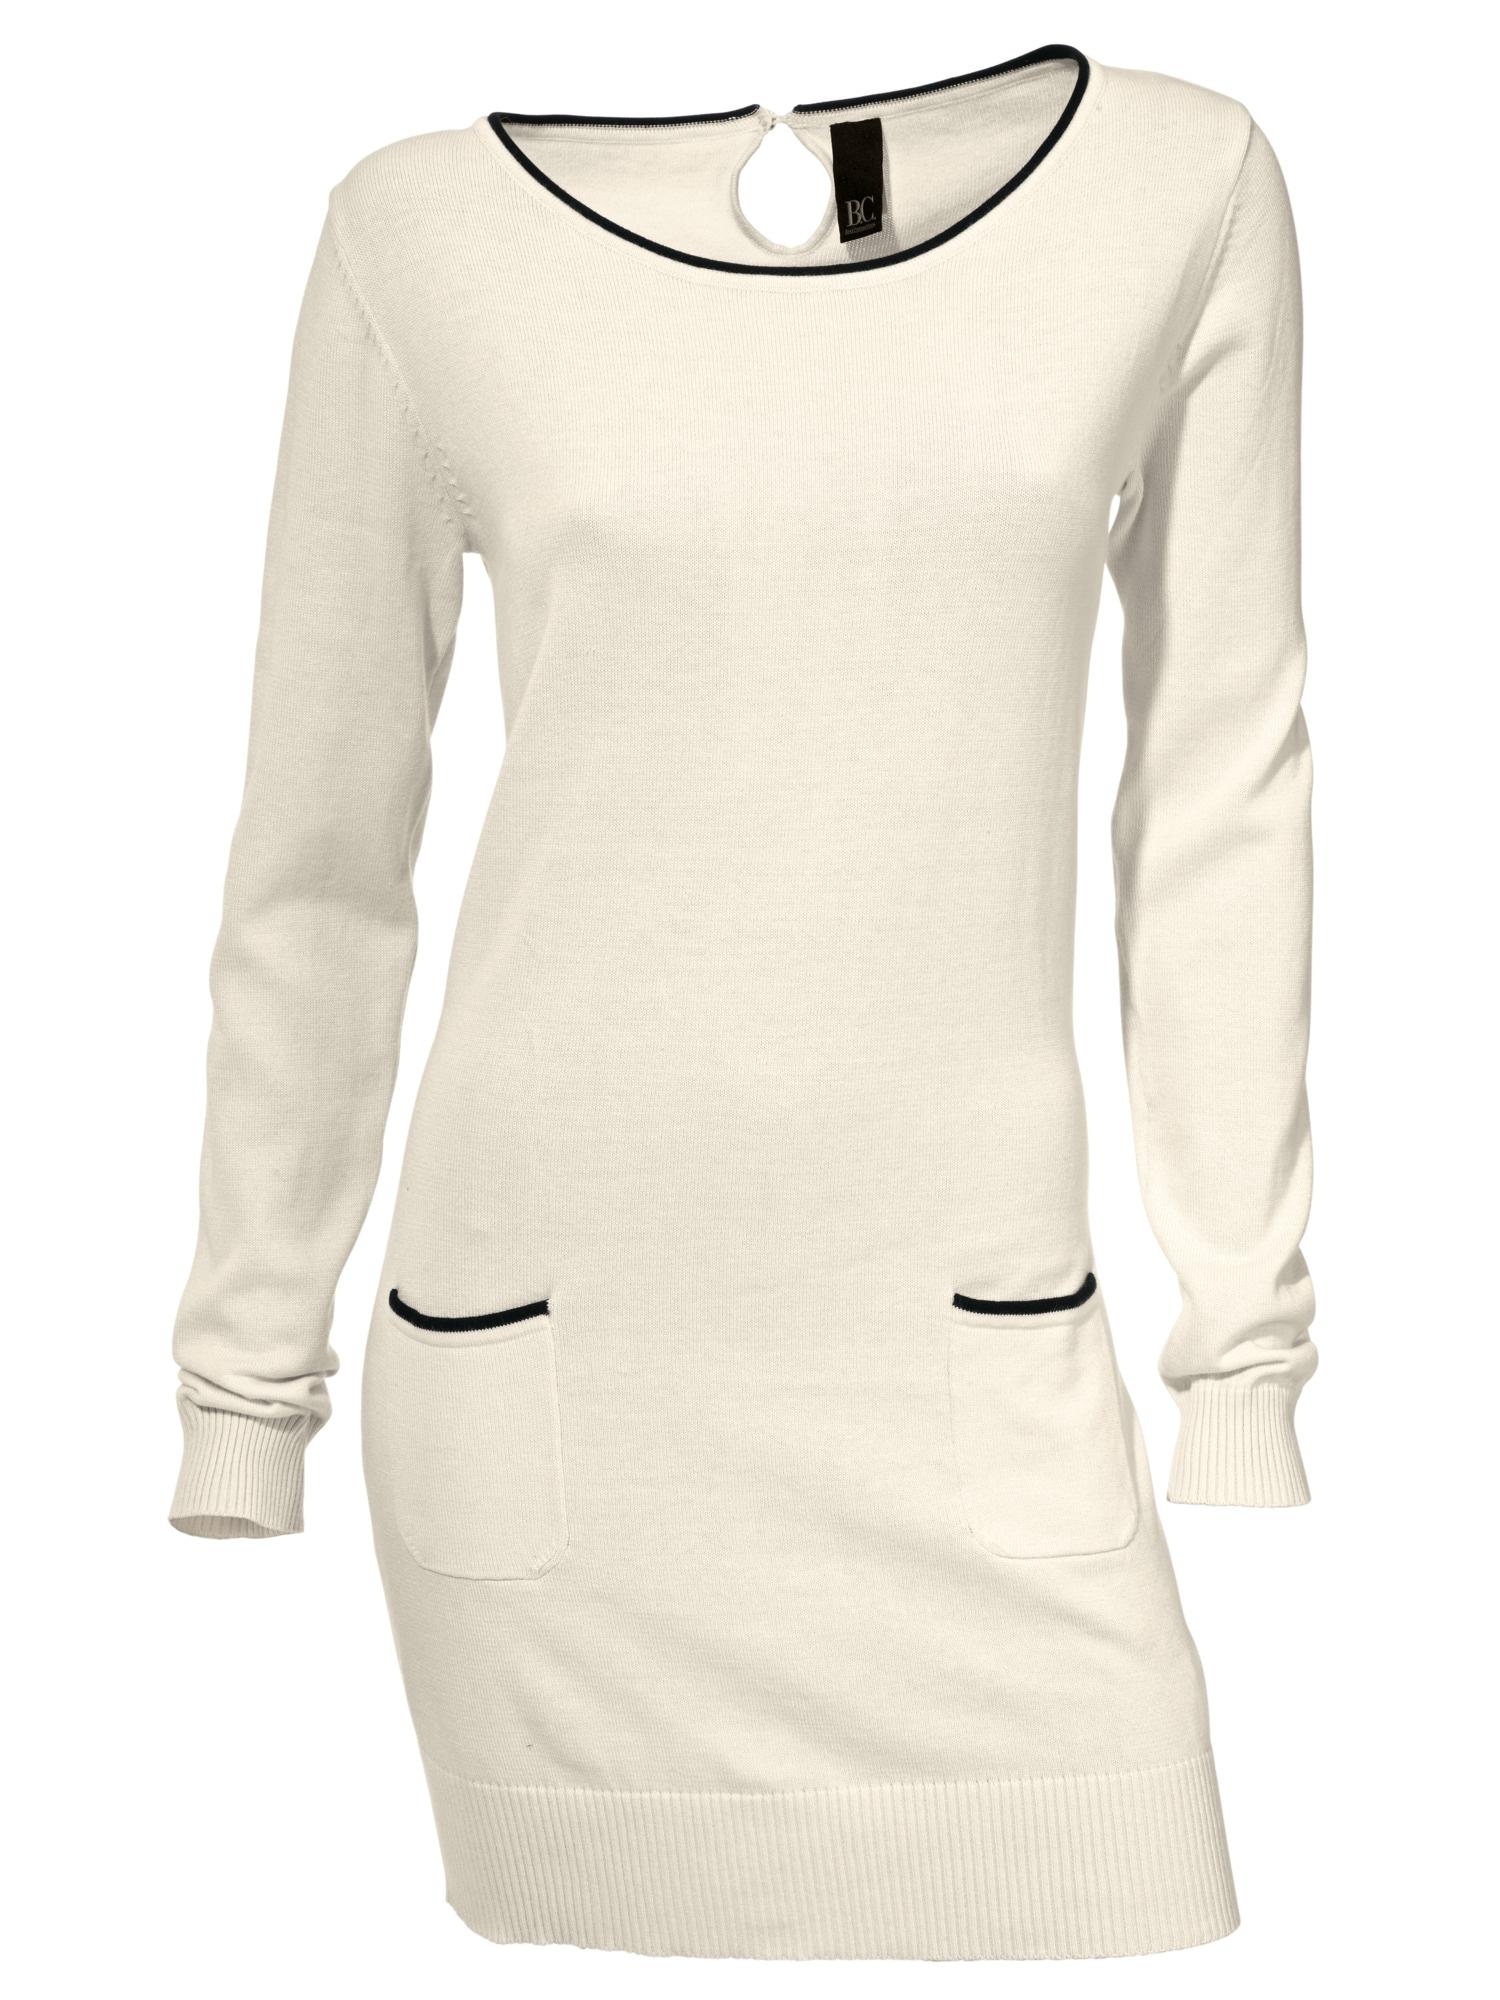 heine CASUAL Longpullover in Feinstrick | Bekleidung > Pullover > Longpullover | Weiß | Baumwolle | Heine Casual